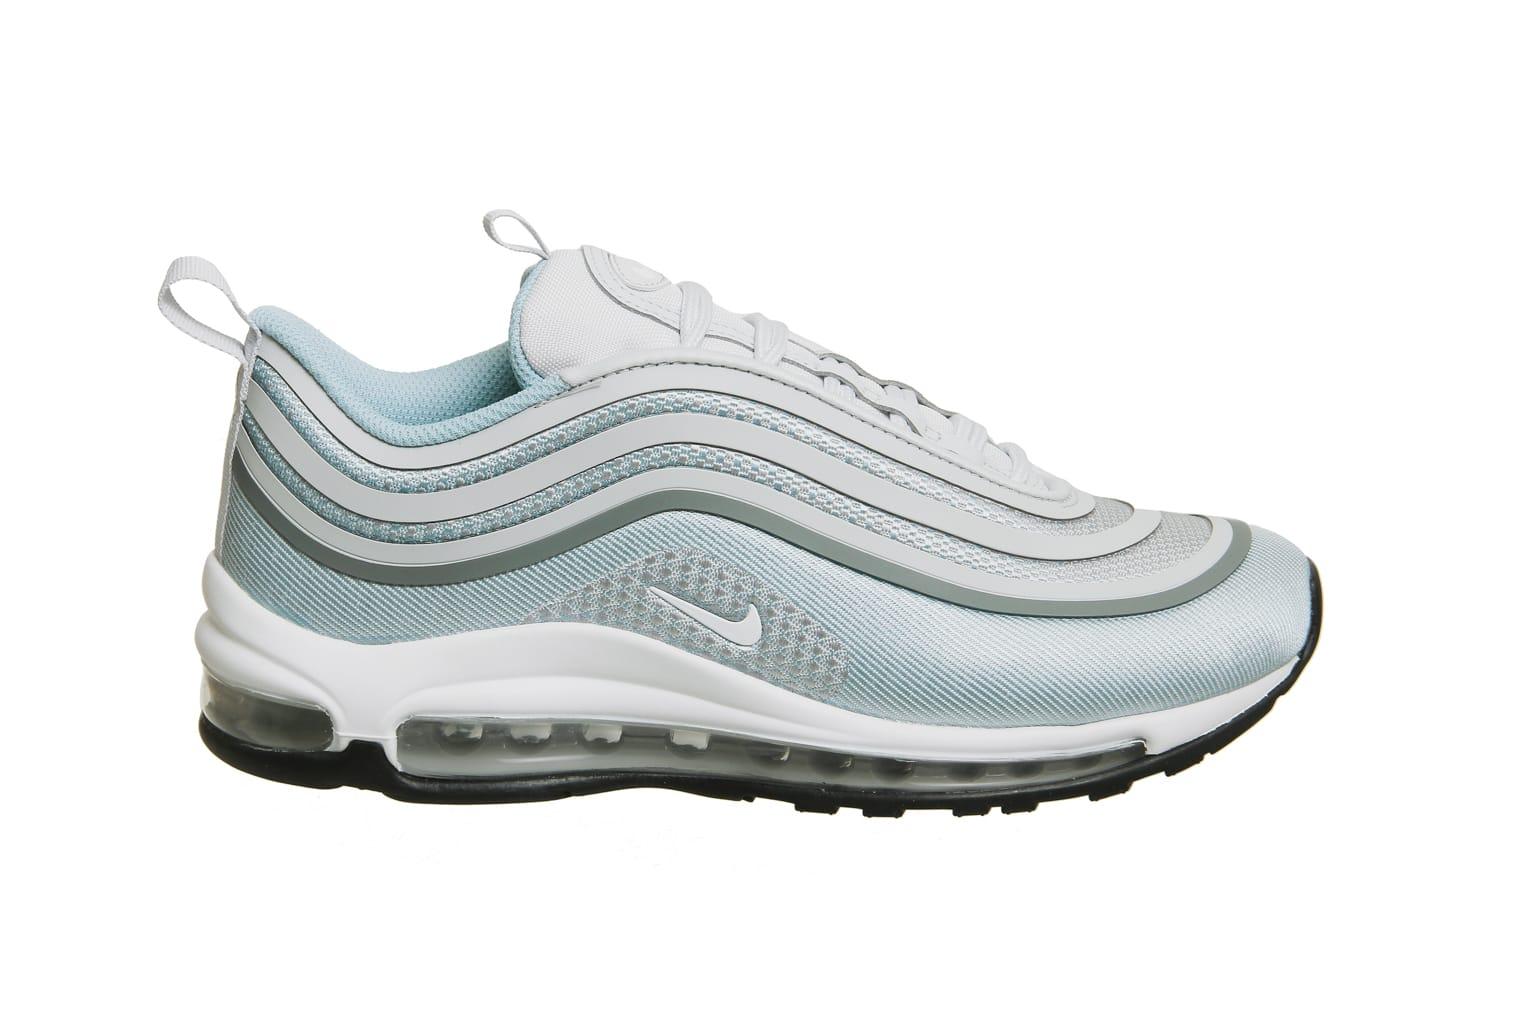 Nike Air Max 97 Releases in Ocean Bliss